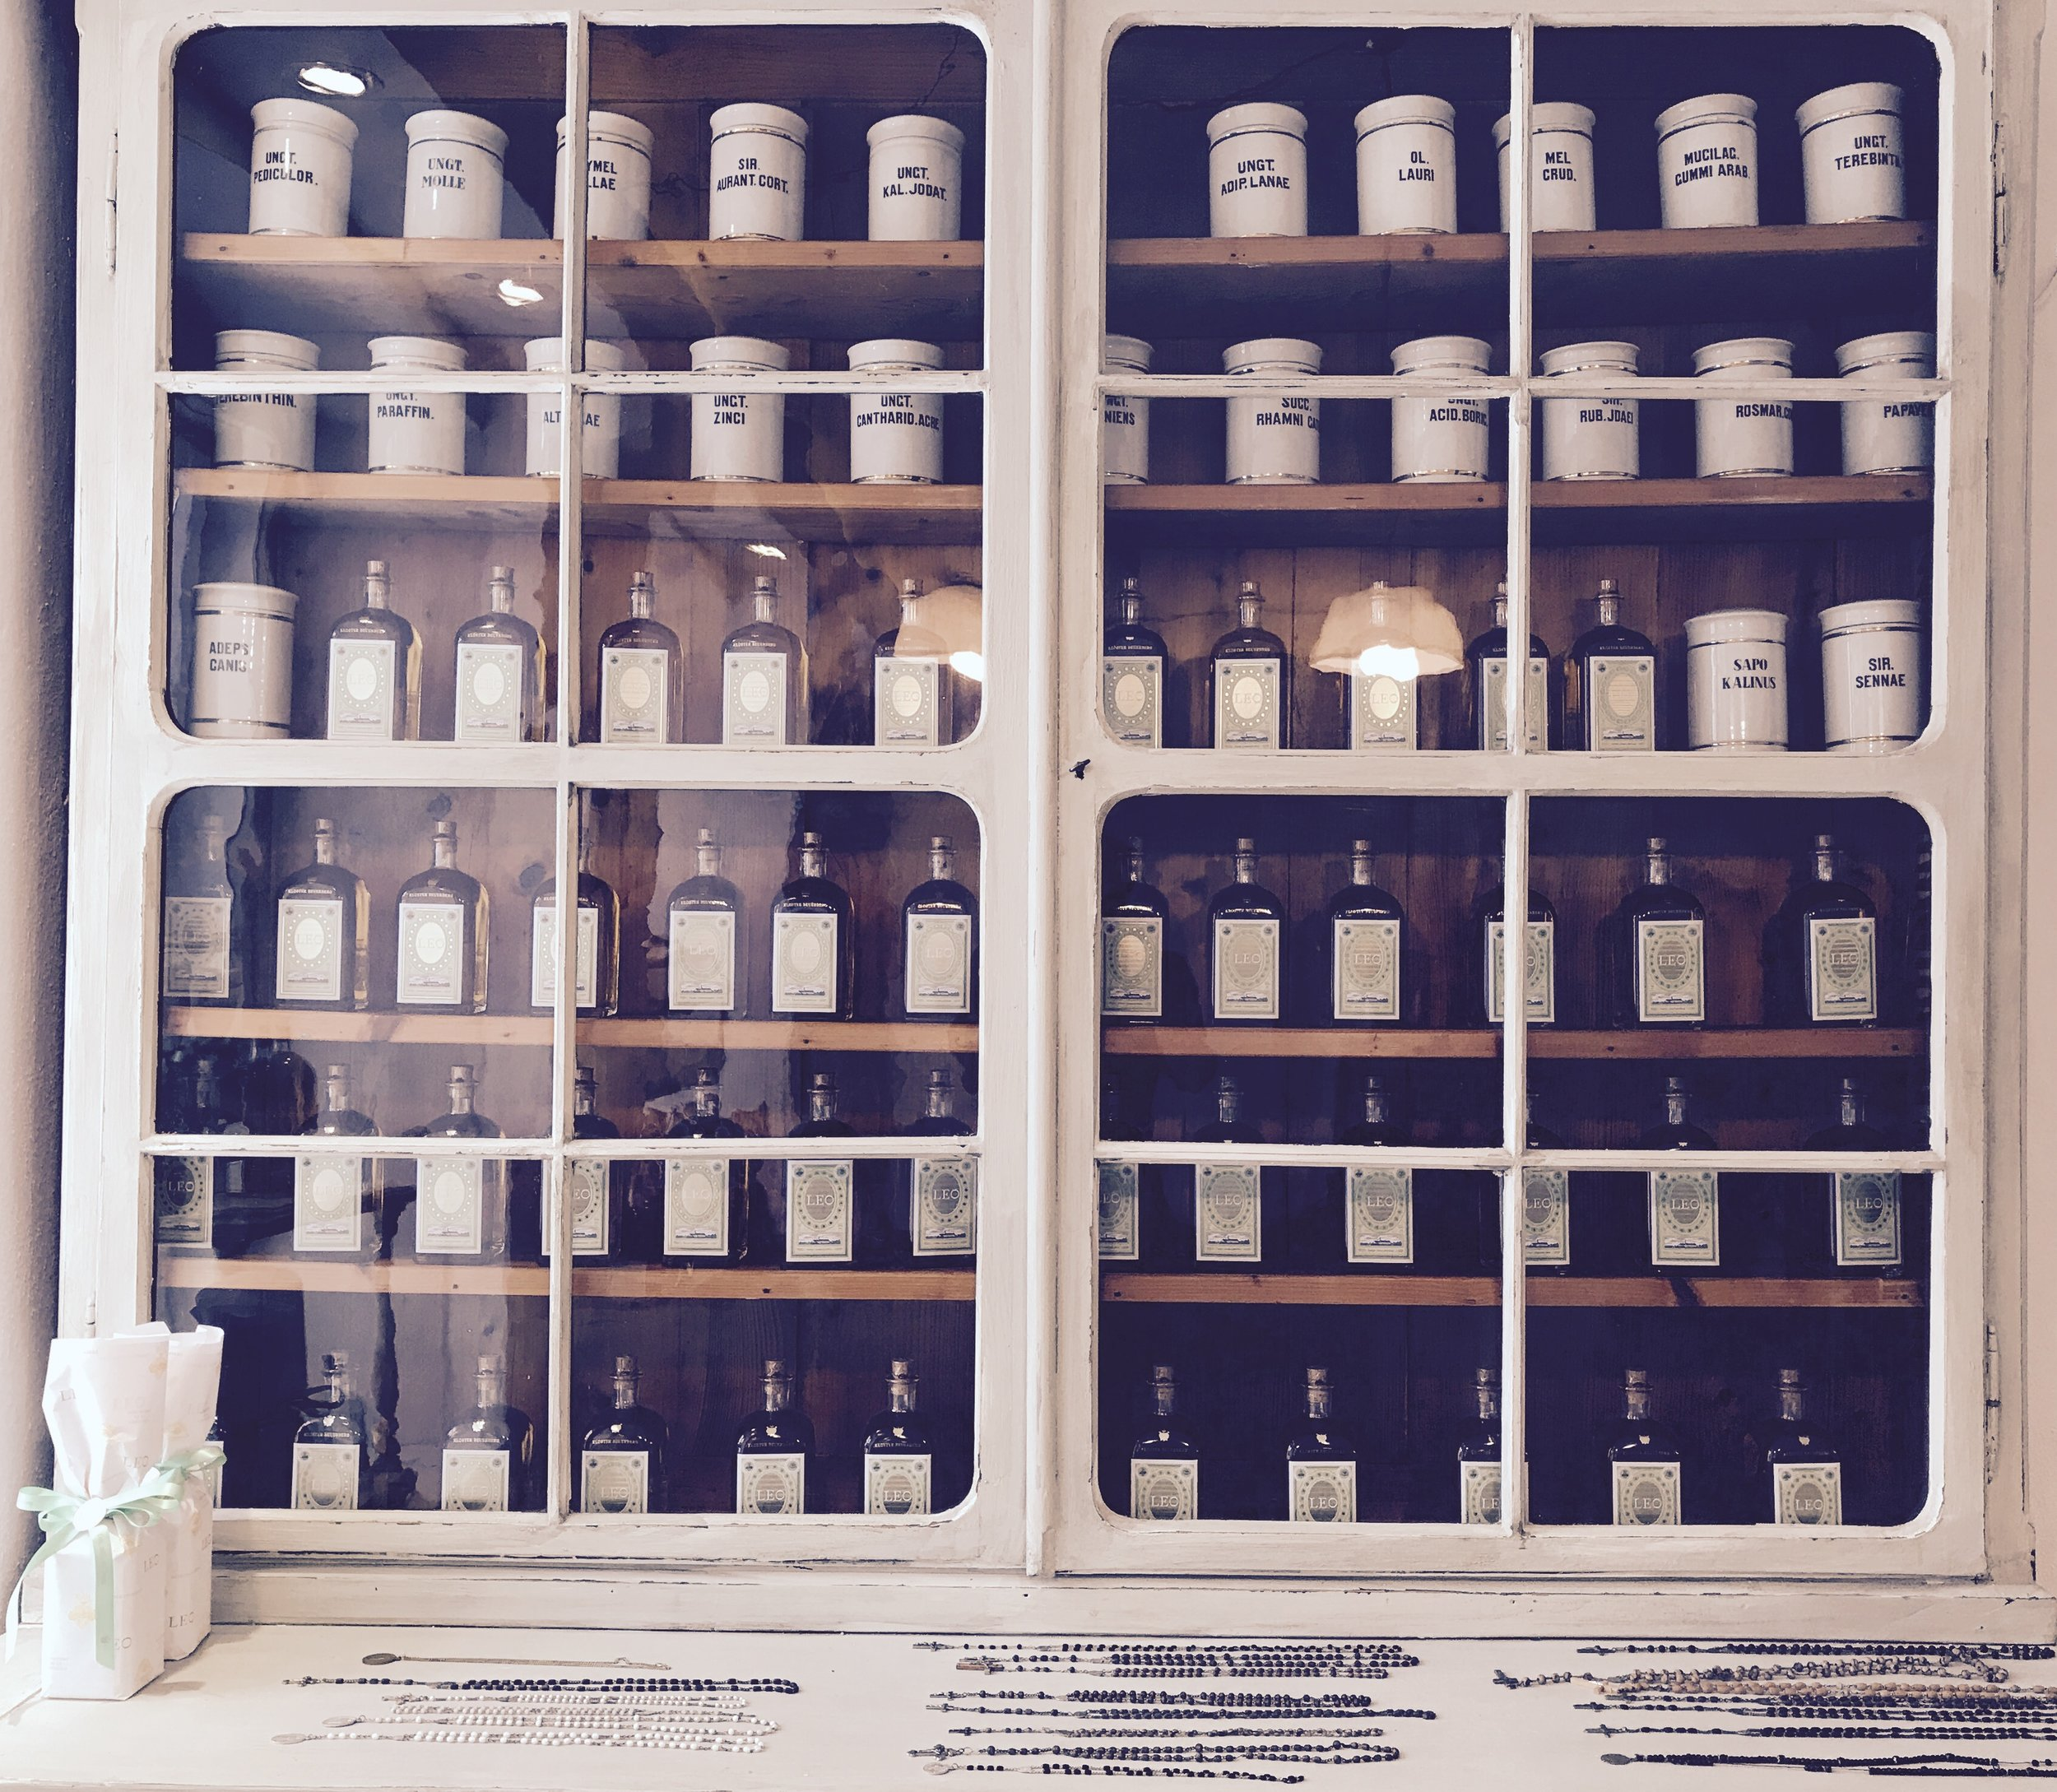 the dandelion liquor, 35%